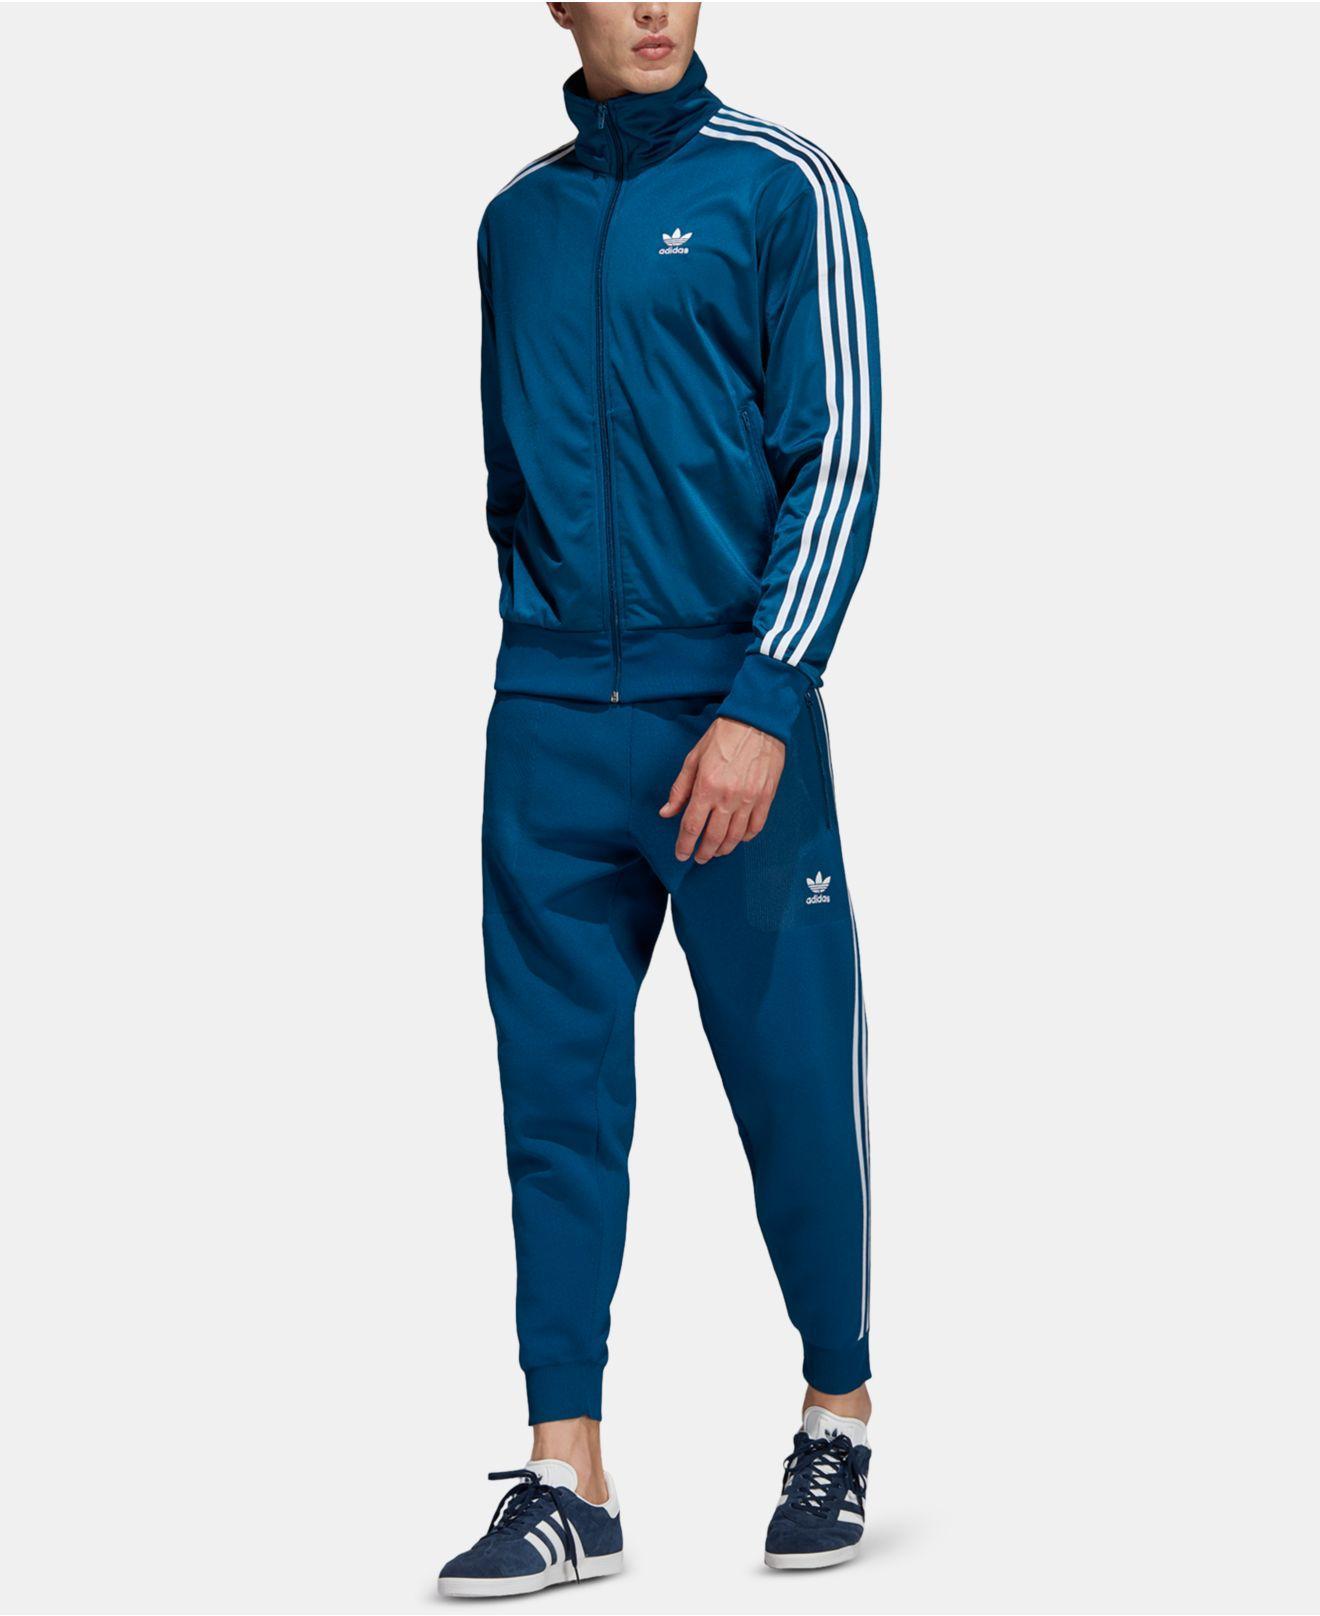 new arrival 9de55 c01a7 Lyst - adidas Adicolor Firebird Track Jacket in Blue for Men